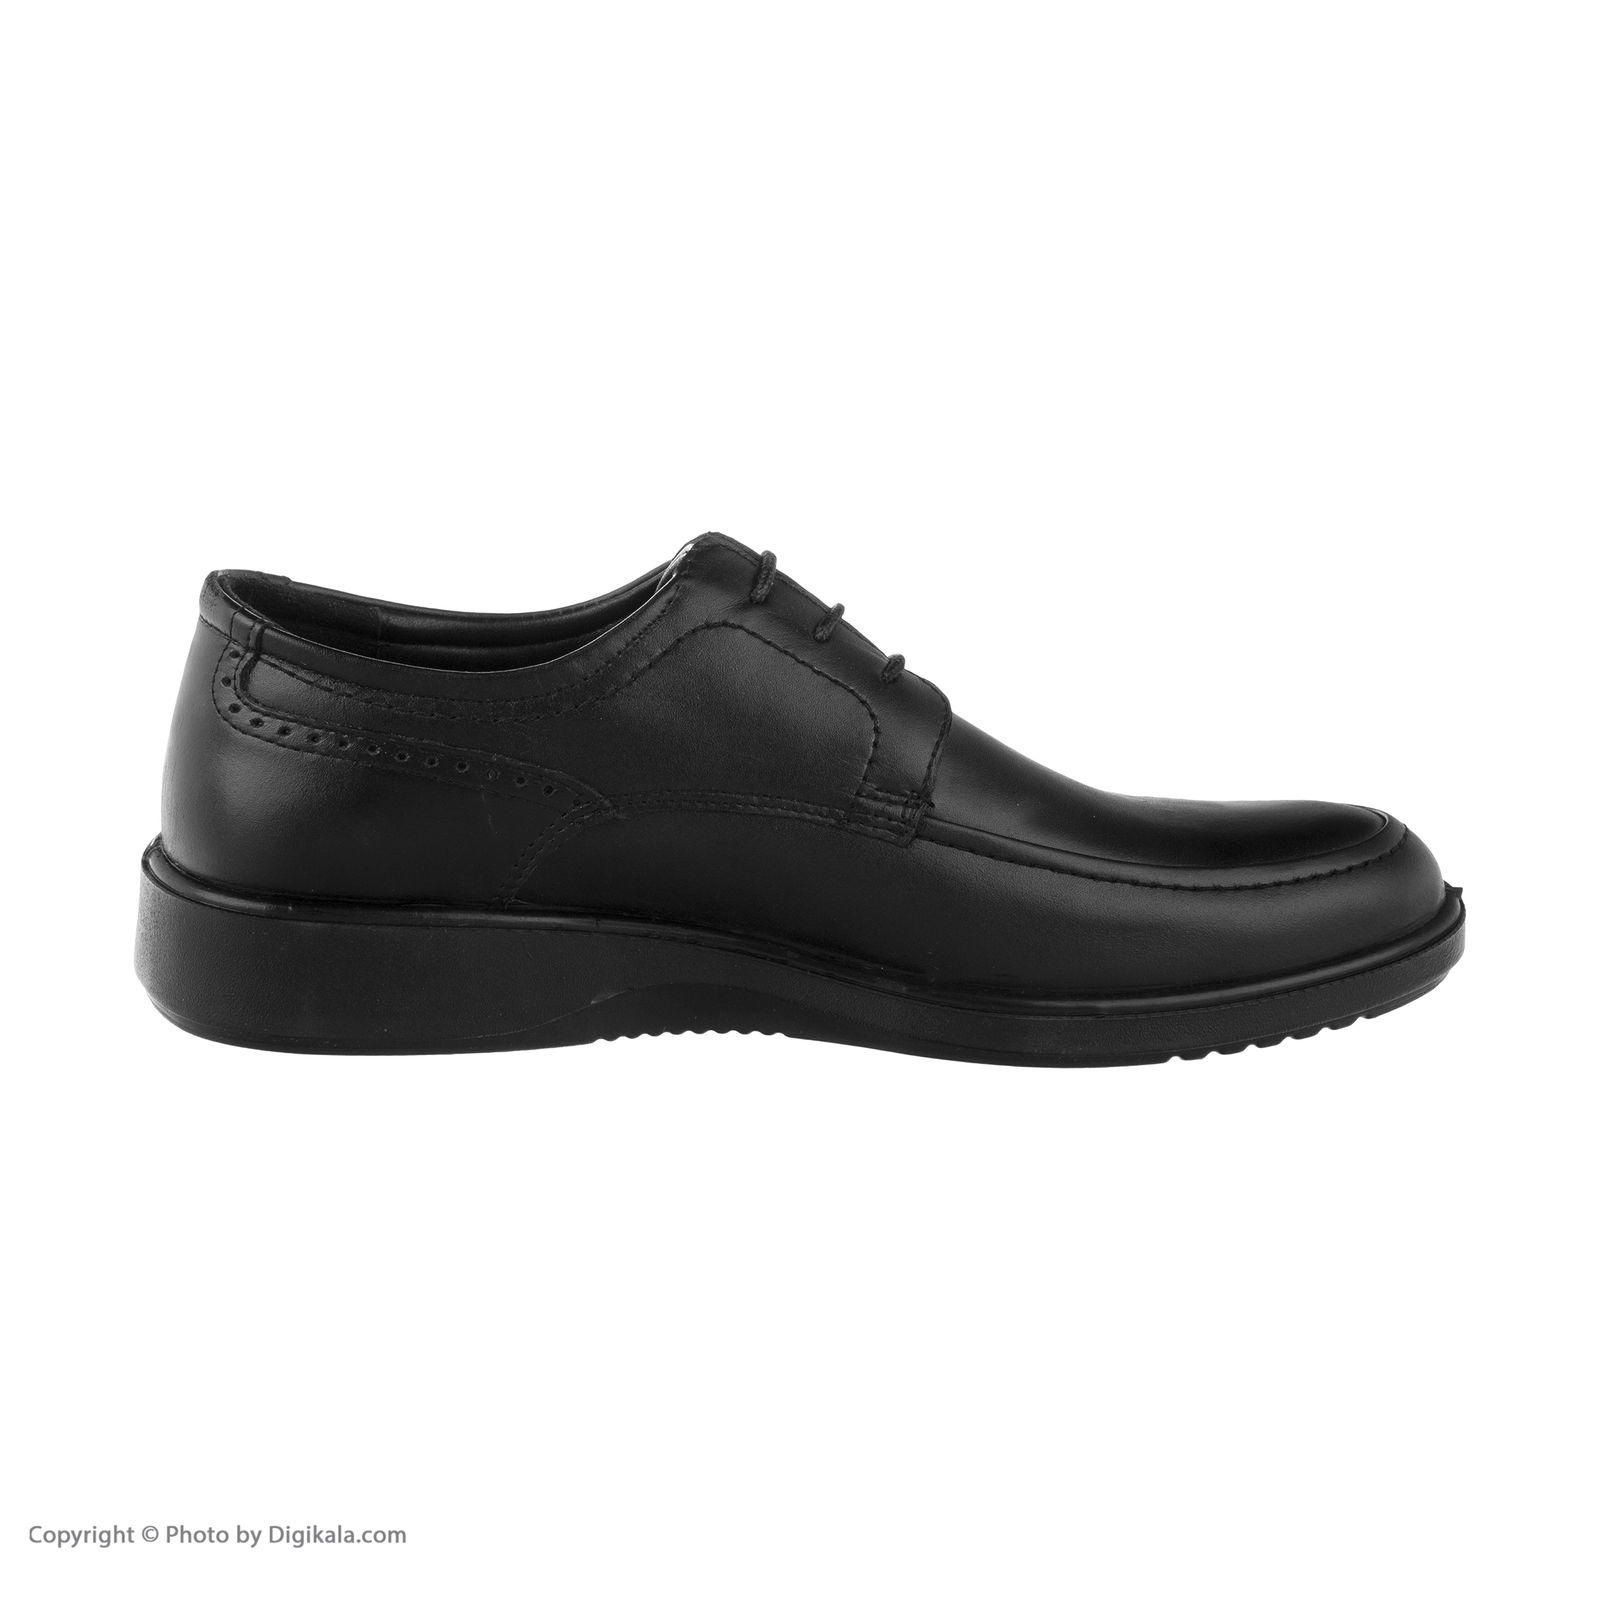 کفش روزمره مردانه سوته مدل 4994E503101 -  - 6